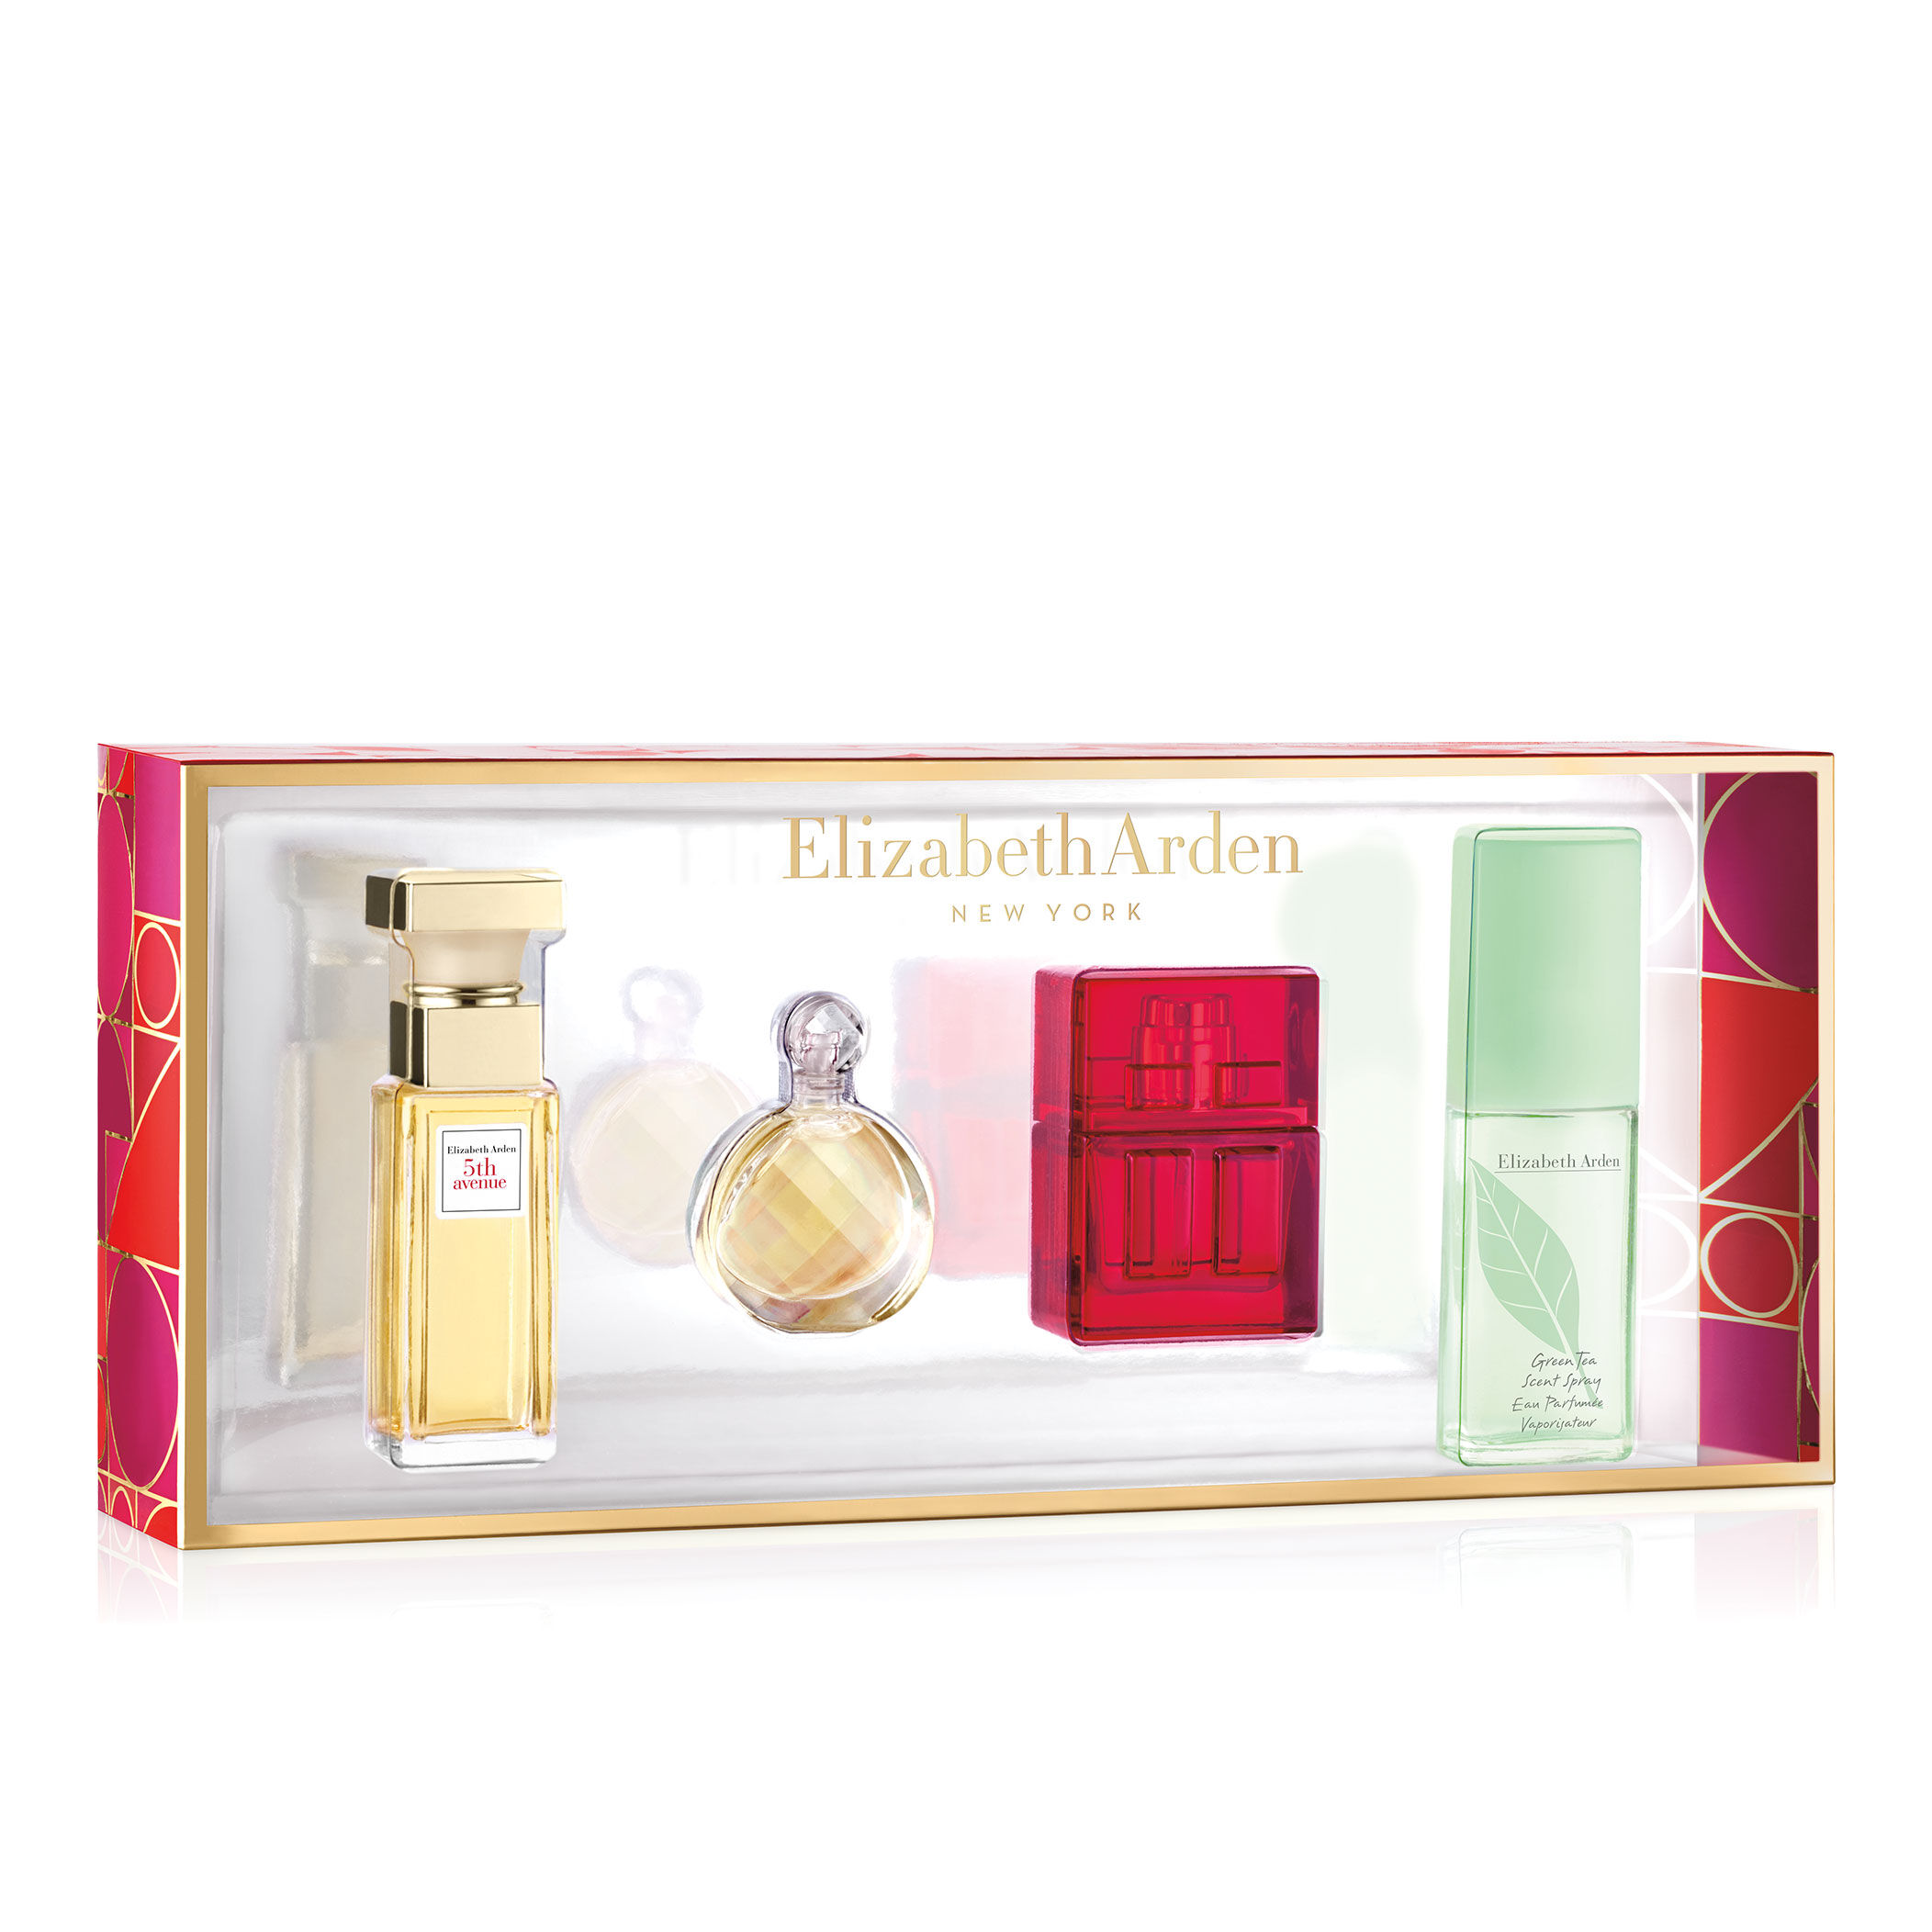 Perfume and Fragrance Gift Sets Elizabeth Arden